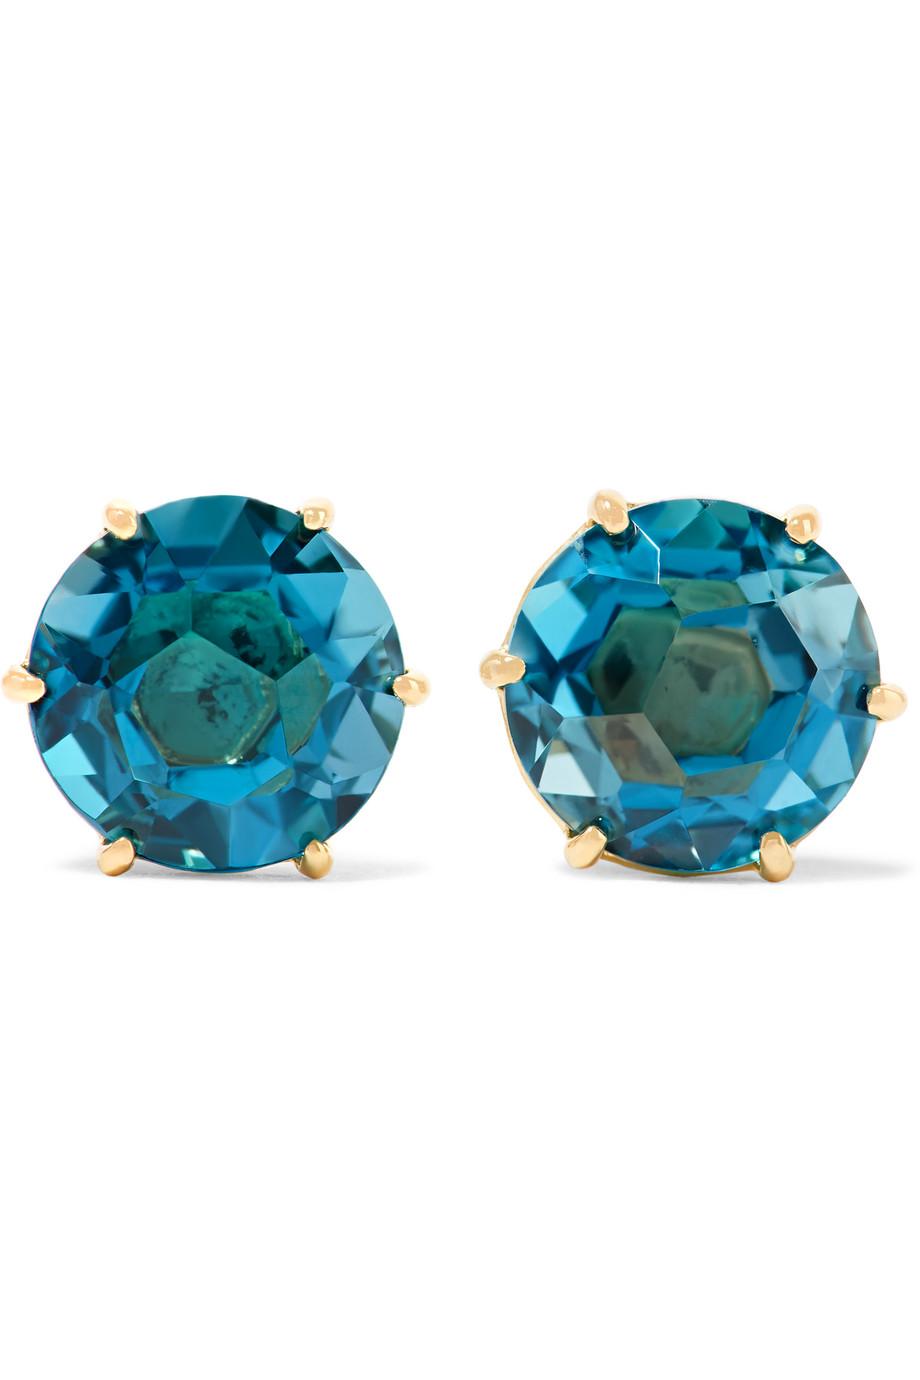 Ippolita Rock Candy 18-Karat Gold Topaz Earrings, Gold/Blue, Women's